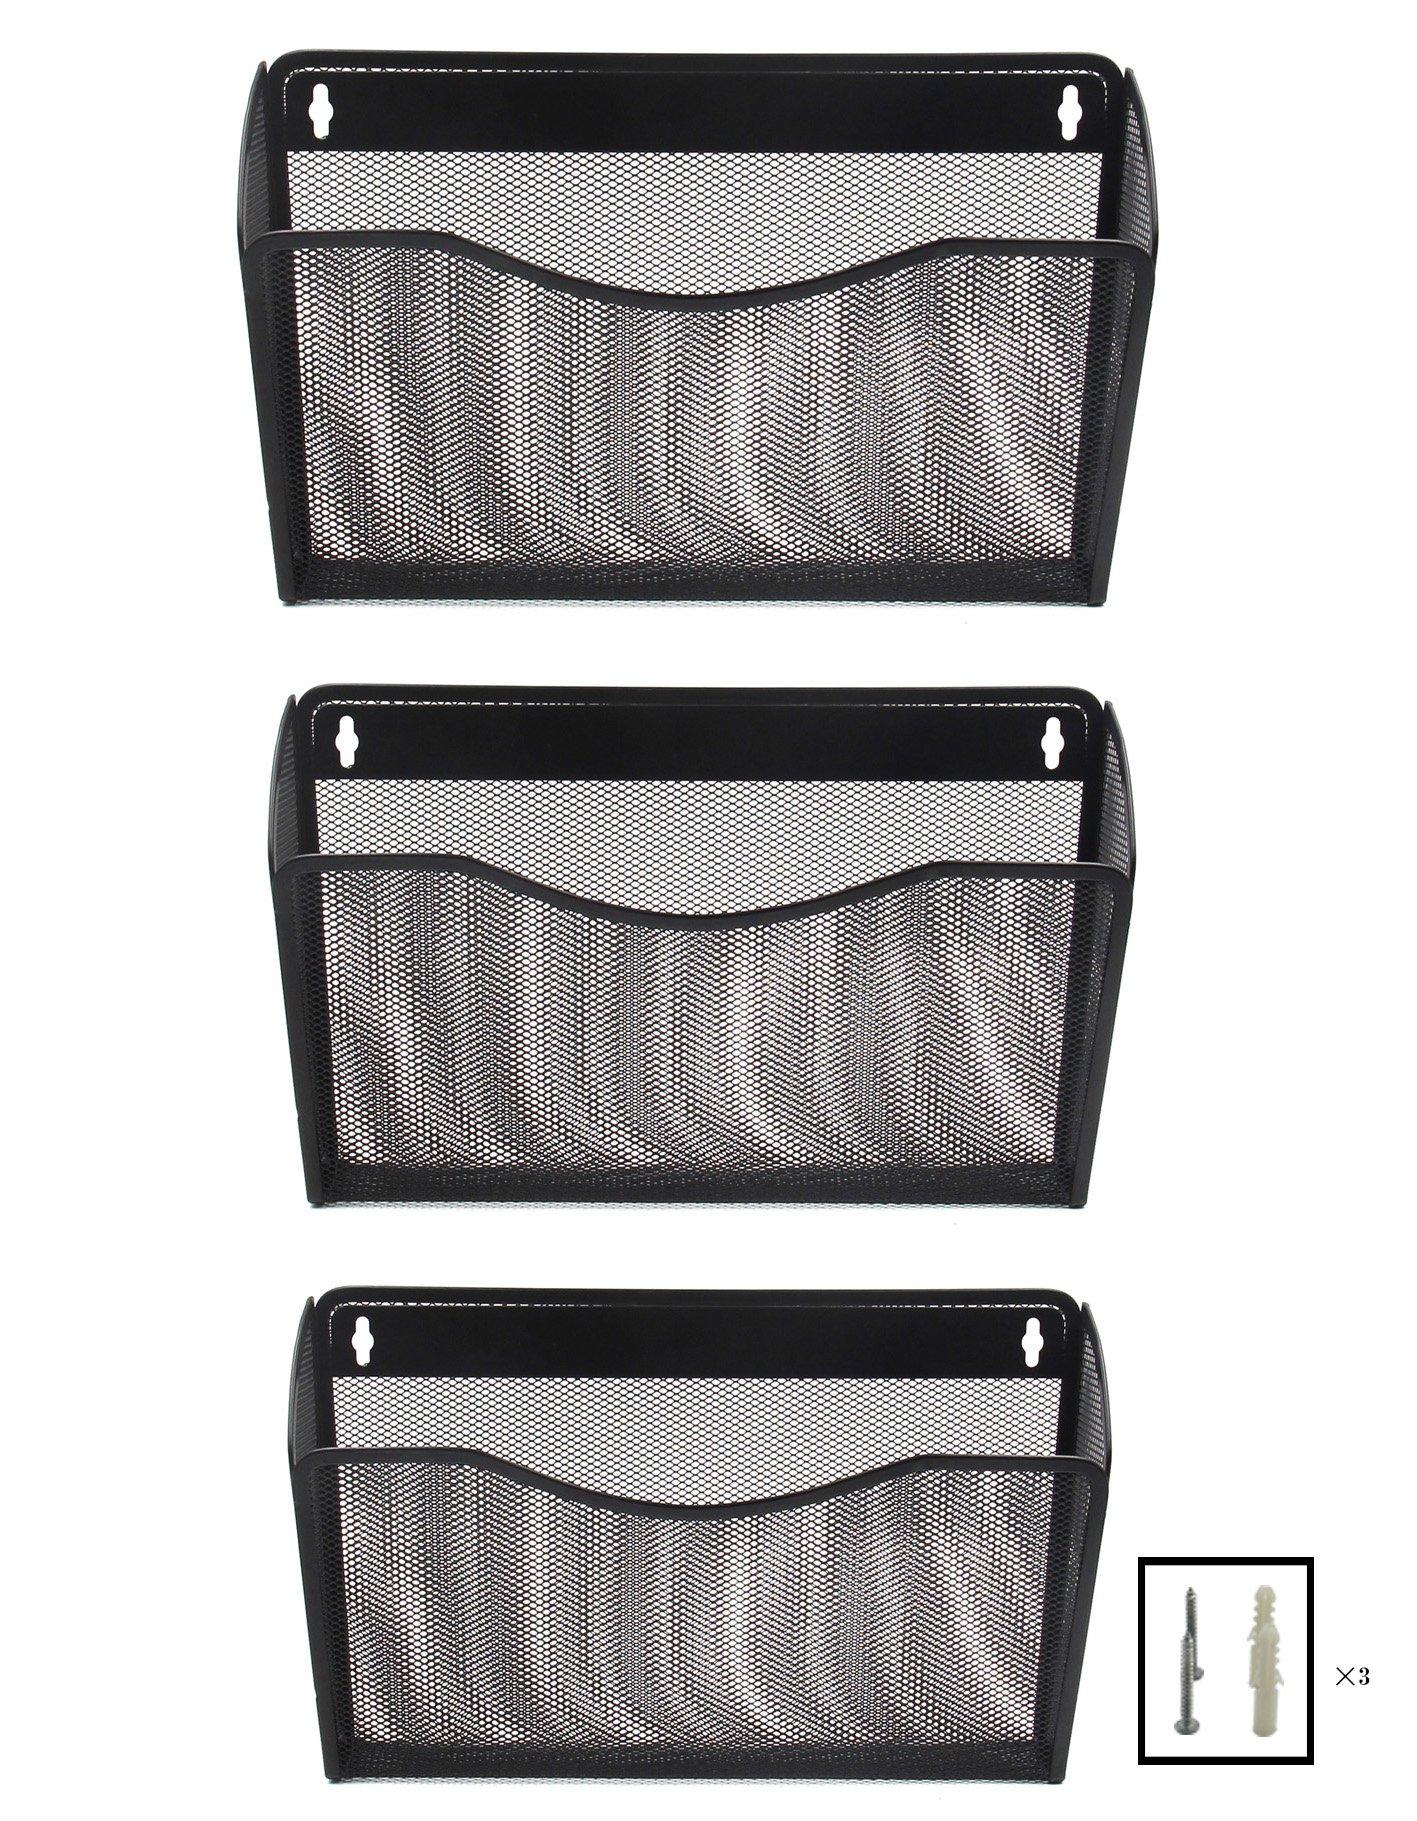 EasyPAG 3 Pocket Office Mesh Collection Wall File Holder Organizer,Black